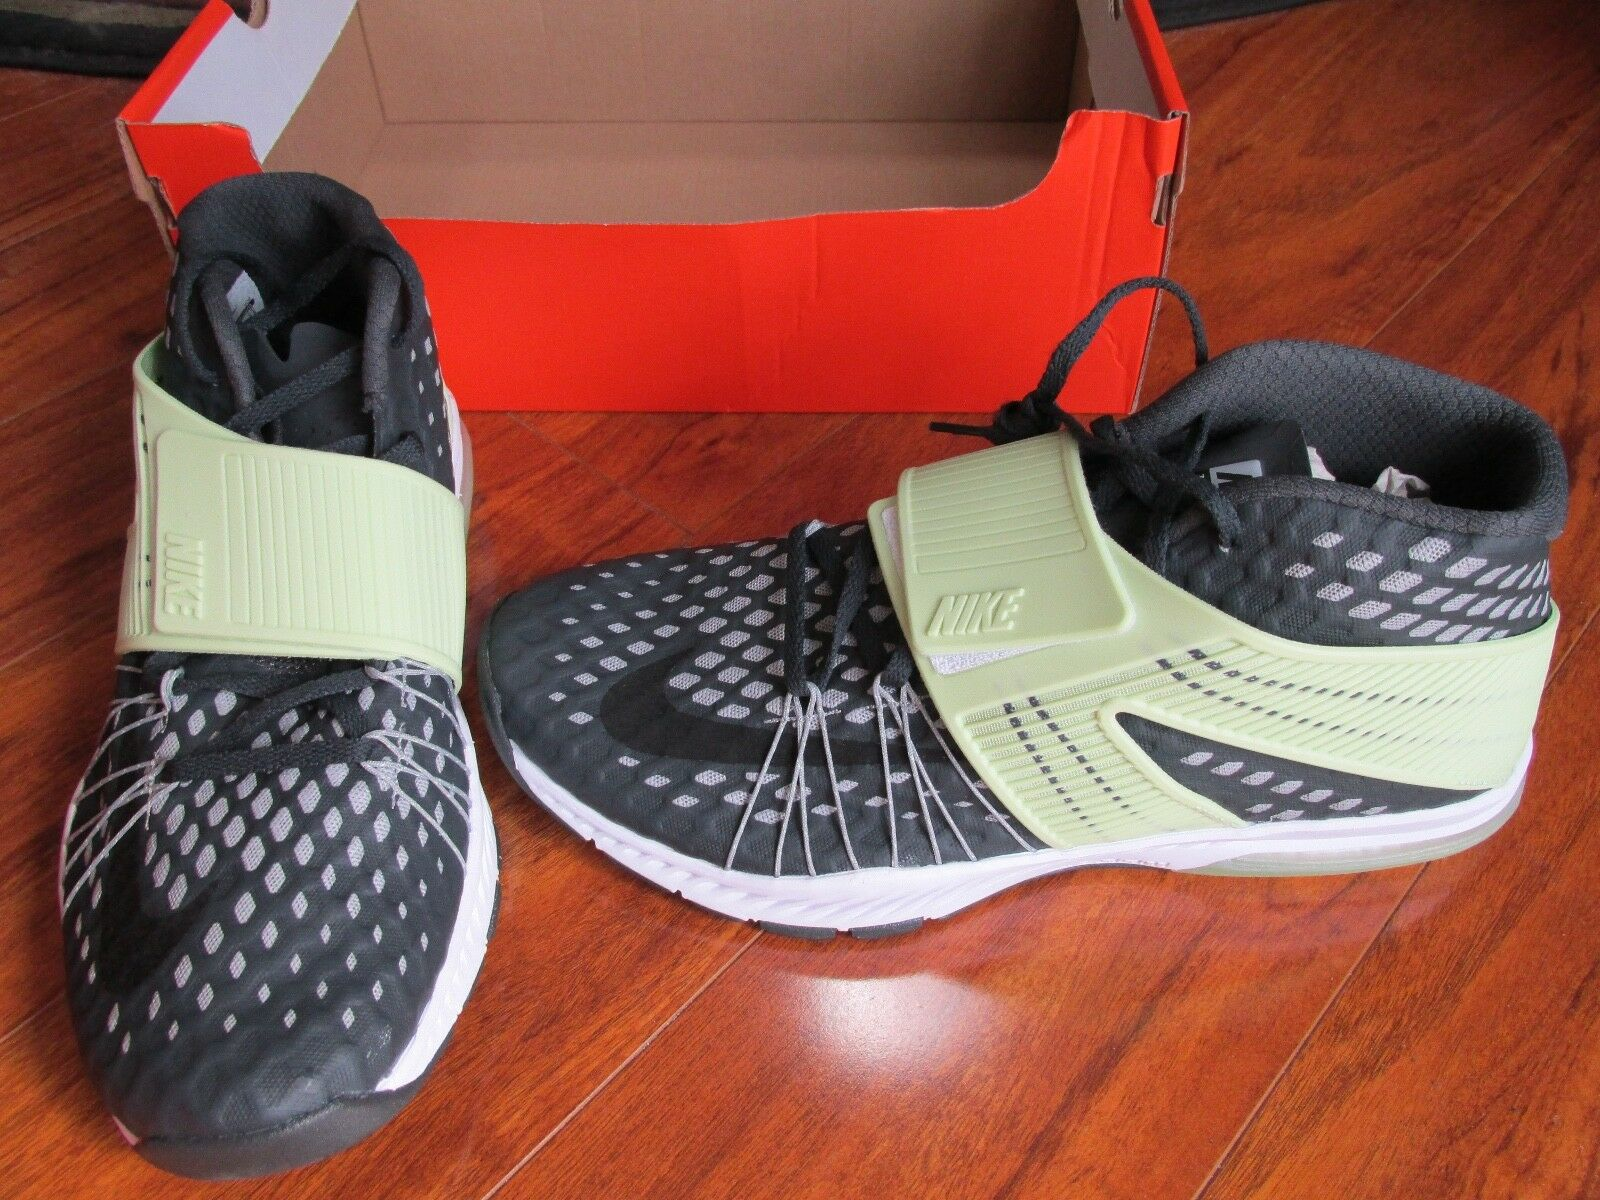 NEW NIKE Zoom Train Toranada AMP Training Shoe Men 10.5 Grey Green 848507 $150.